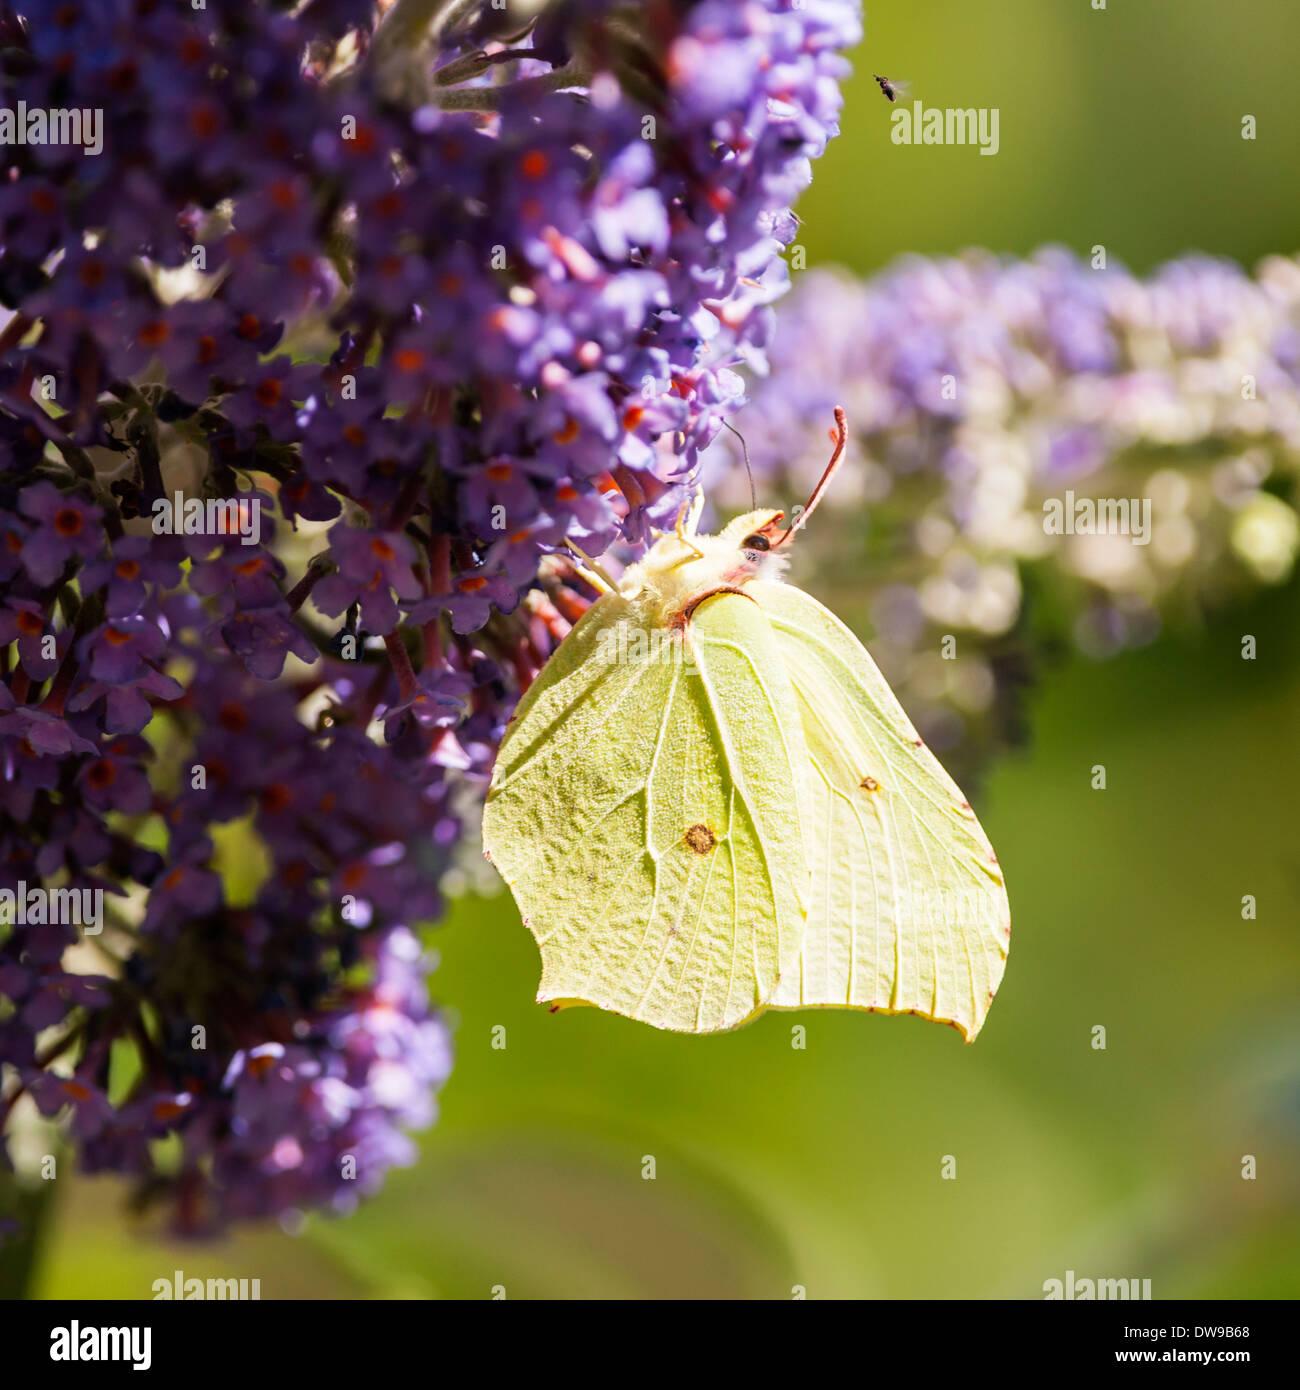 A Brimstone ( Gonepteryx rhamni ) butterfly on Buddleia in the uk Stock Photo